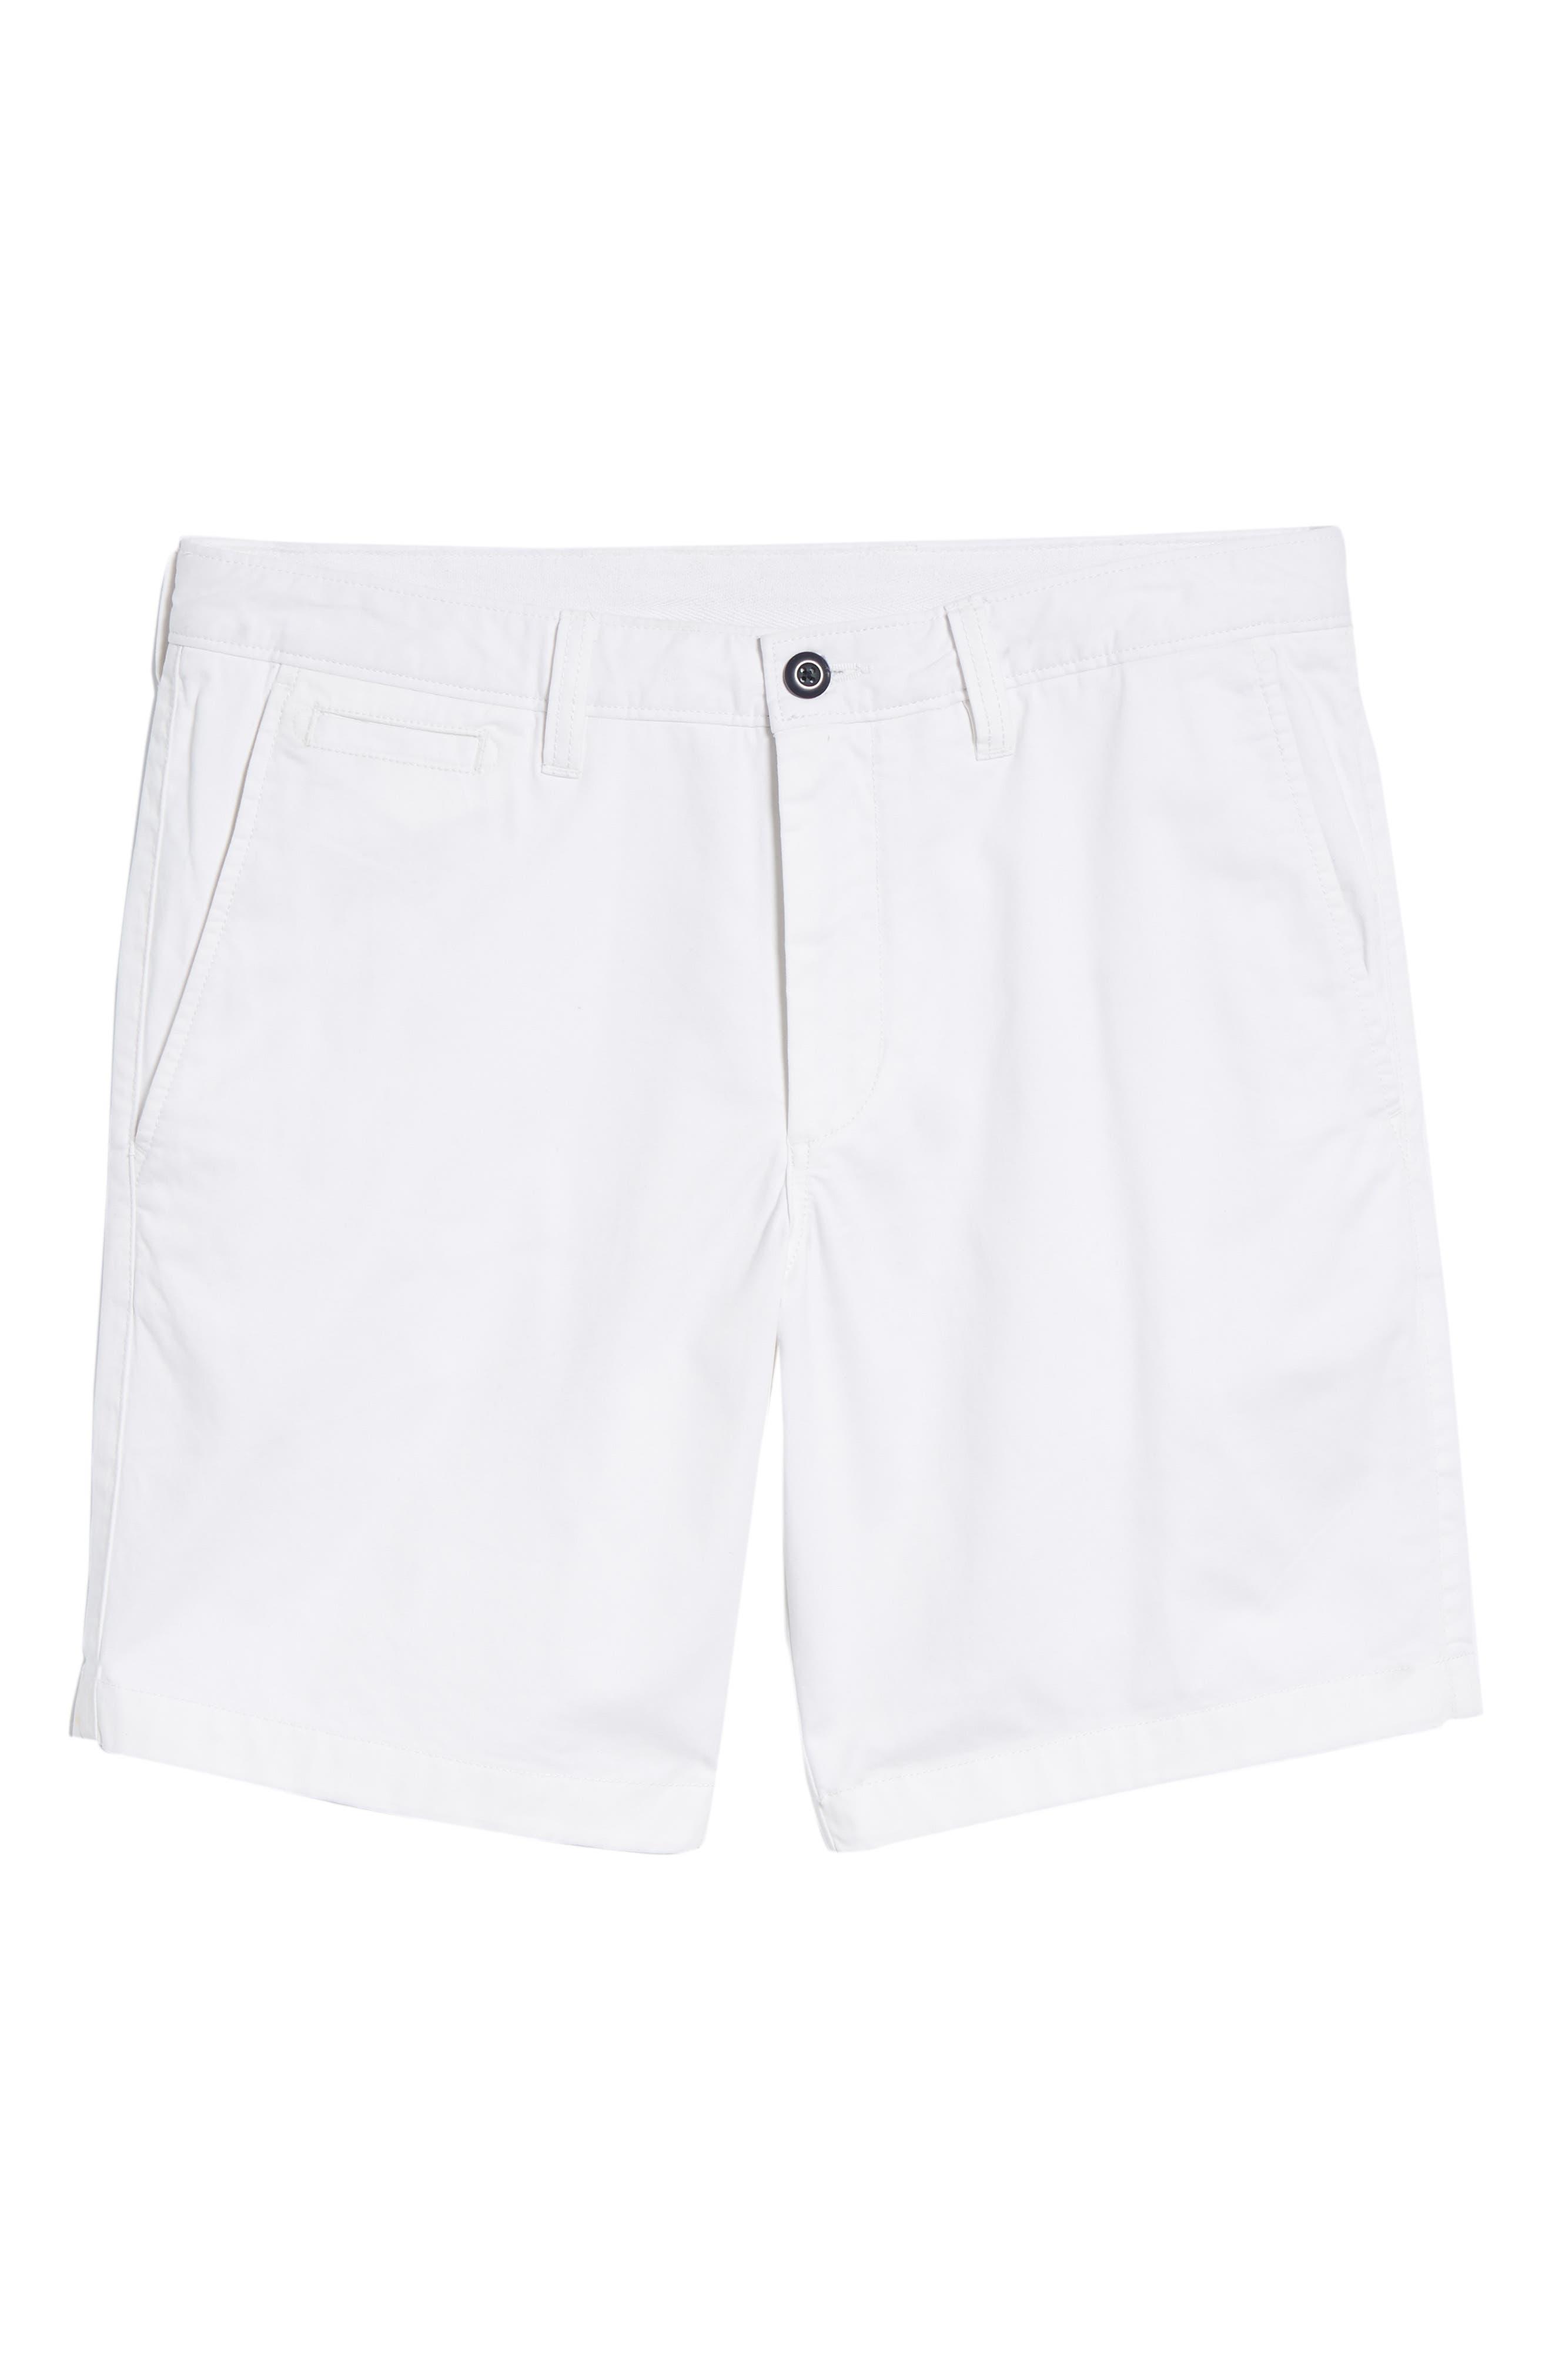 Ballard Slim Fit Stretch Chino 9-Inch Shorts,                             Alternate thumbnail 6, color,                             WHITE